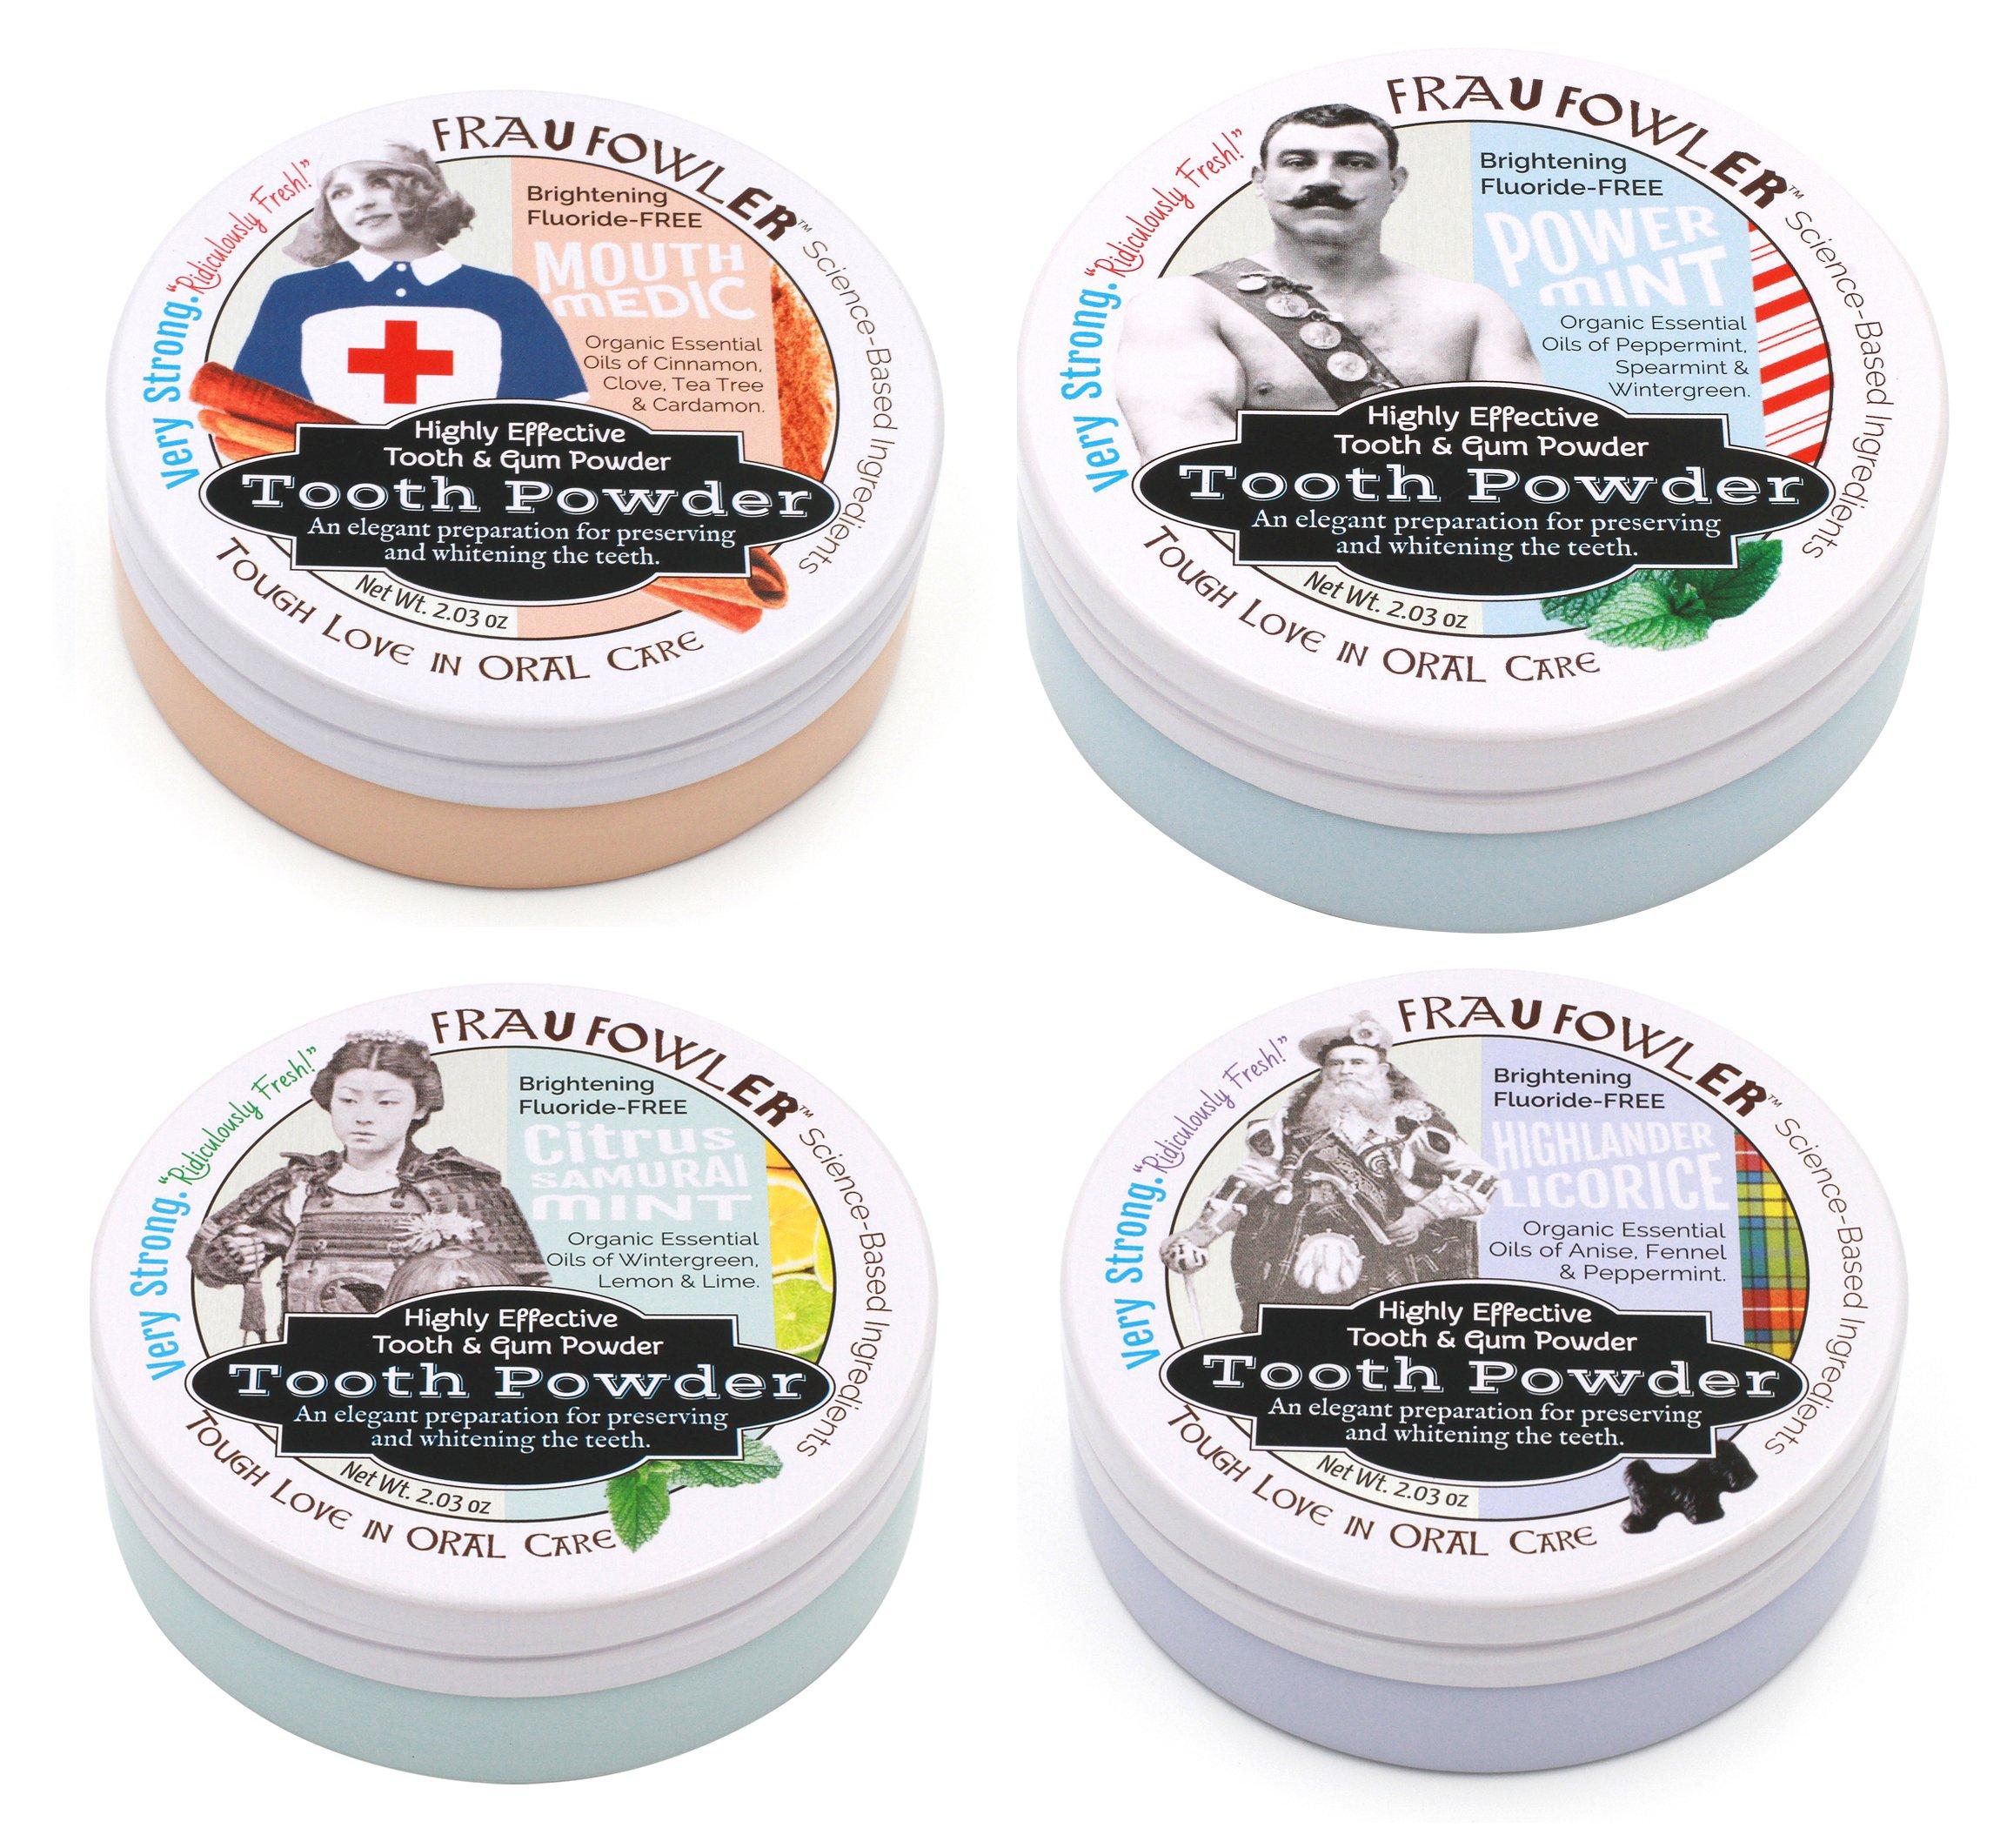 Frau Fowler Variety Pack Tooth & Gum Powder 4 Pack